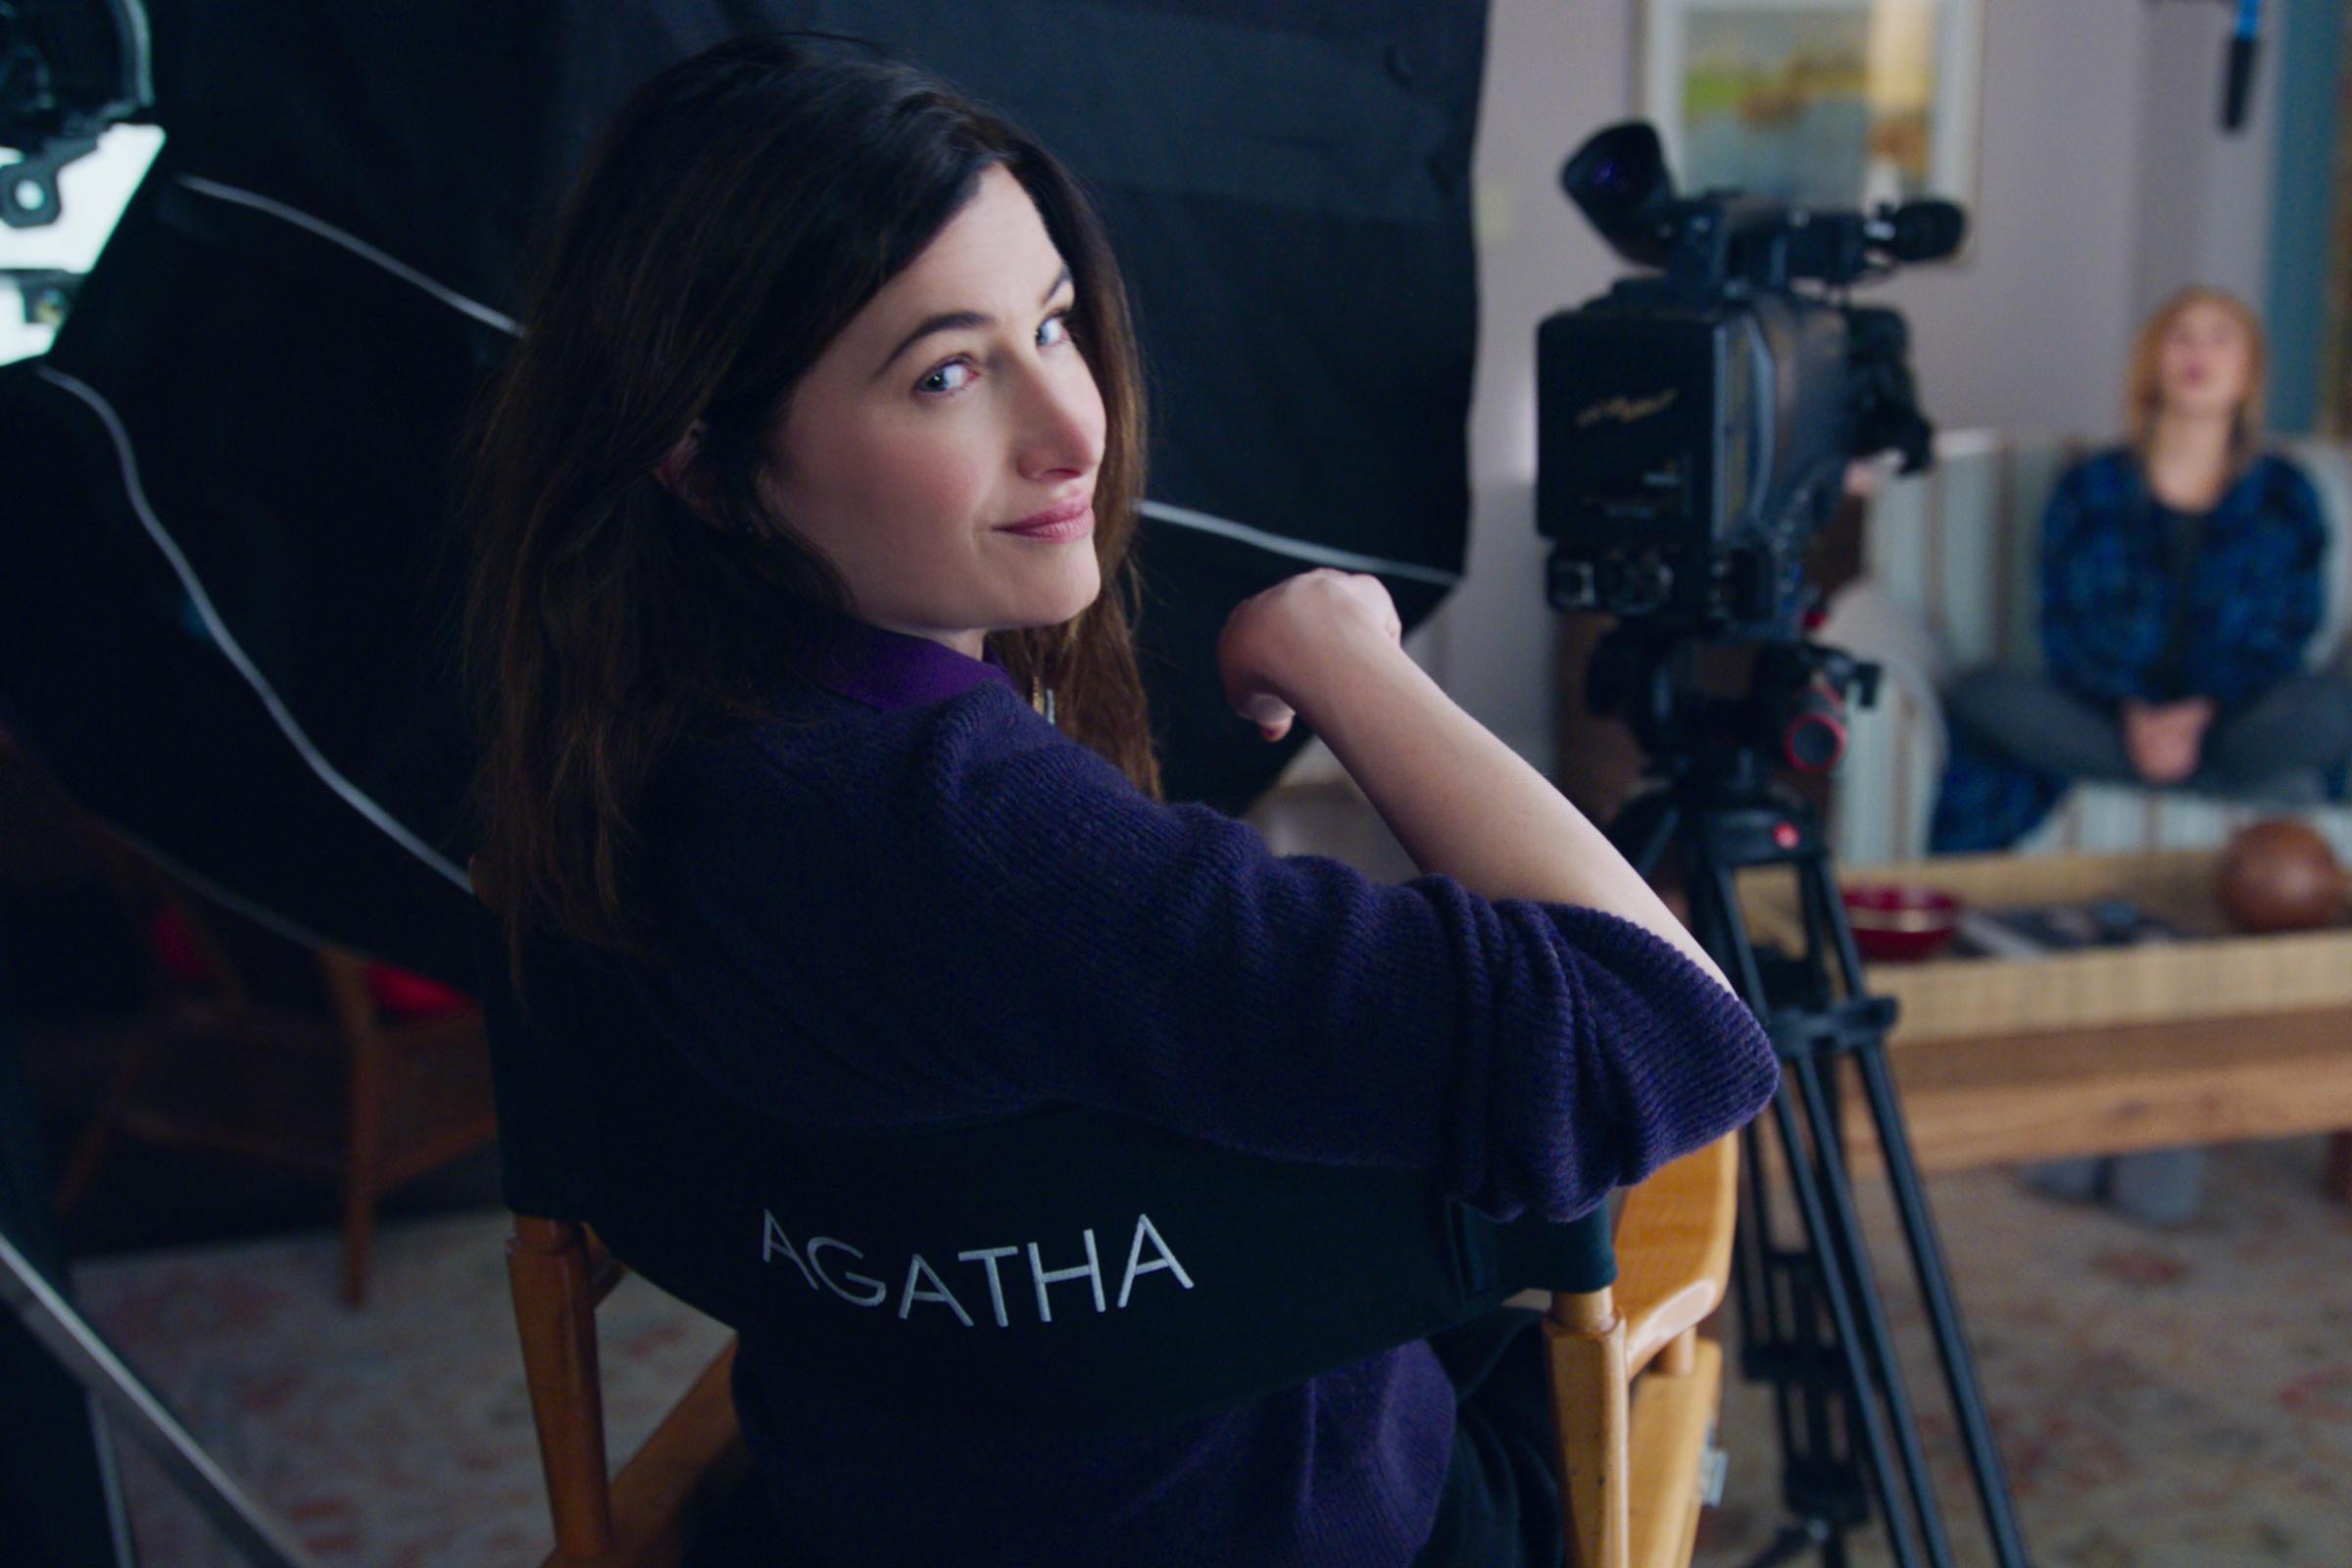 'WandaVision' Star Kathryn Hahn's Secret to Building a Scene-Stealing Performance